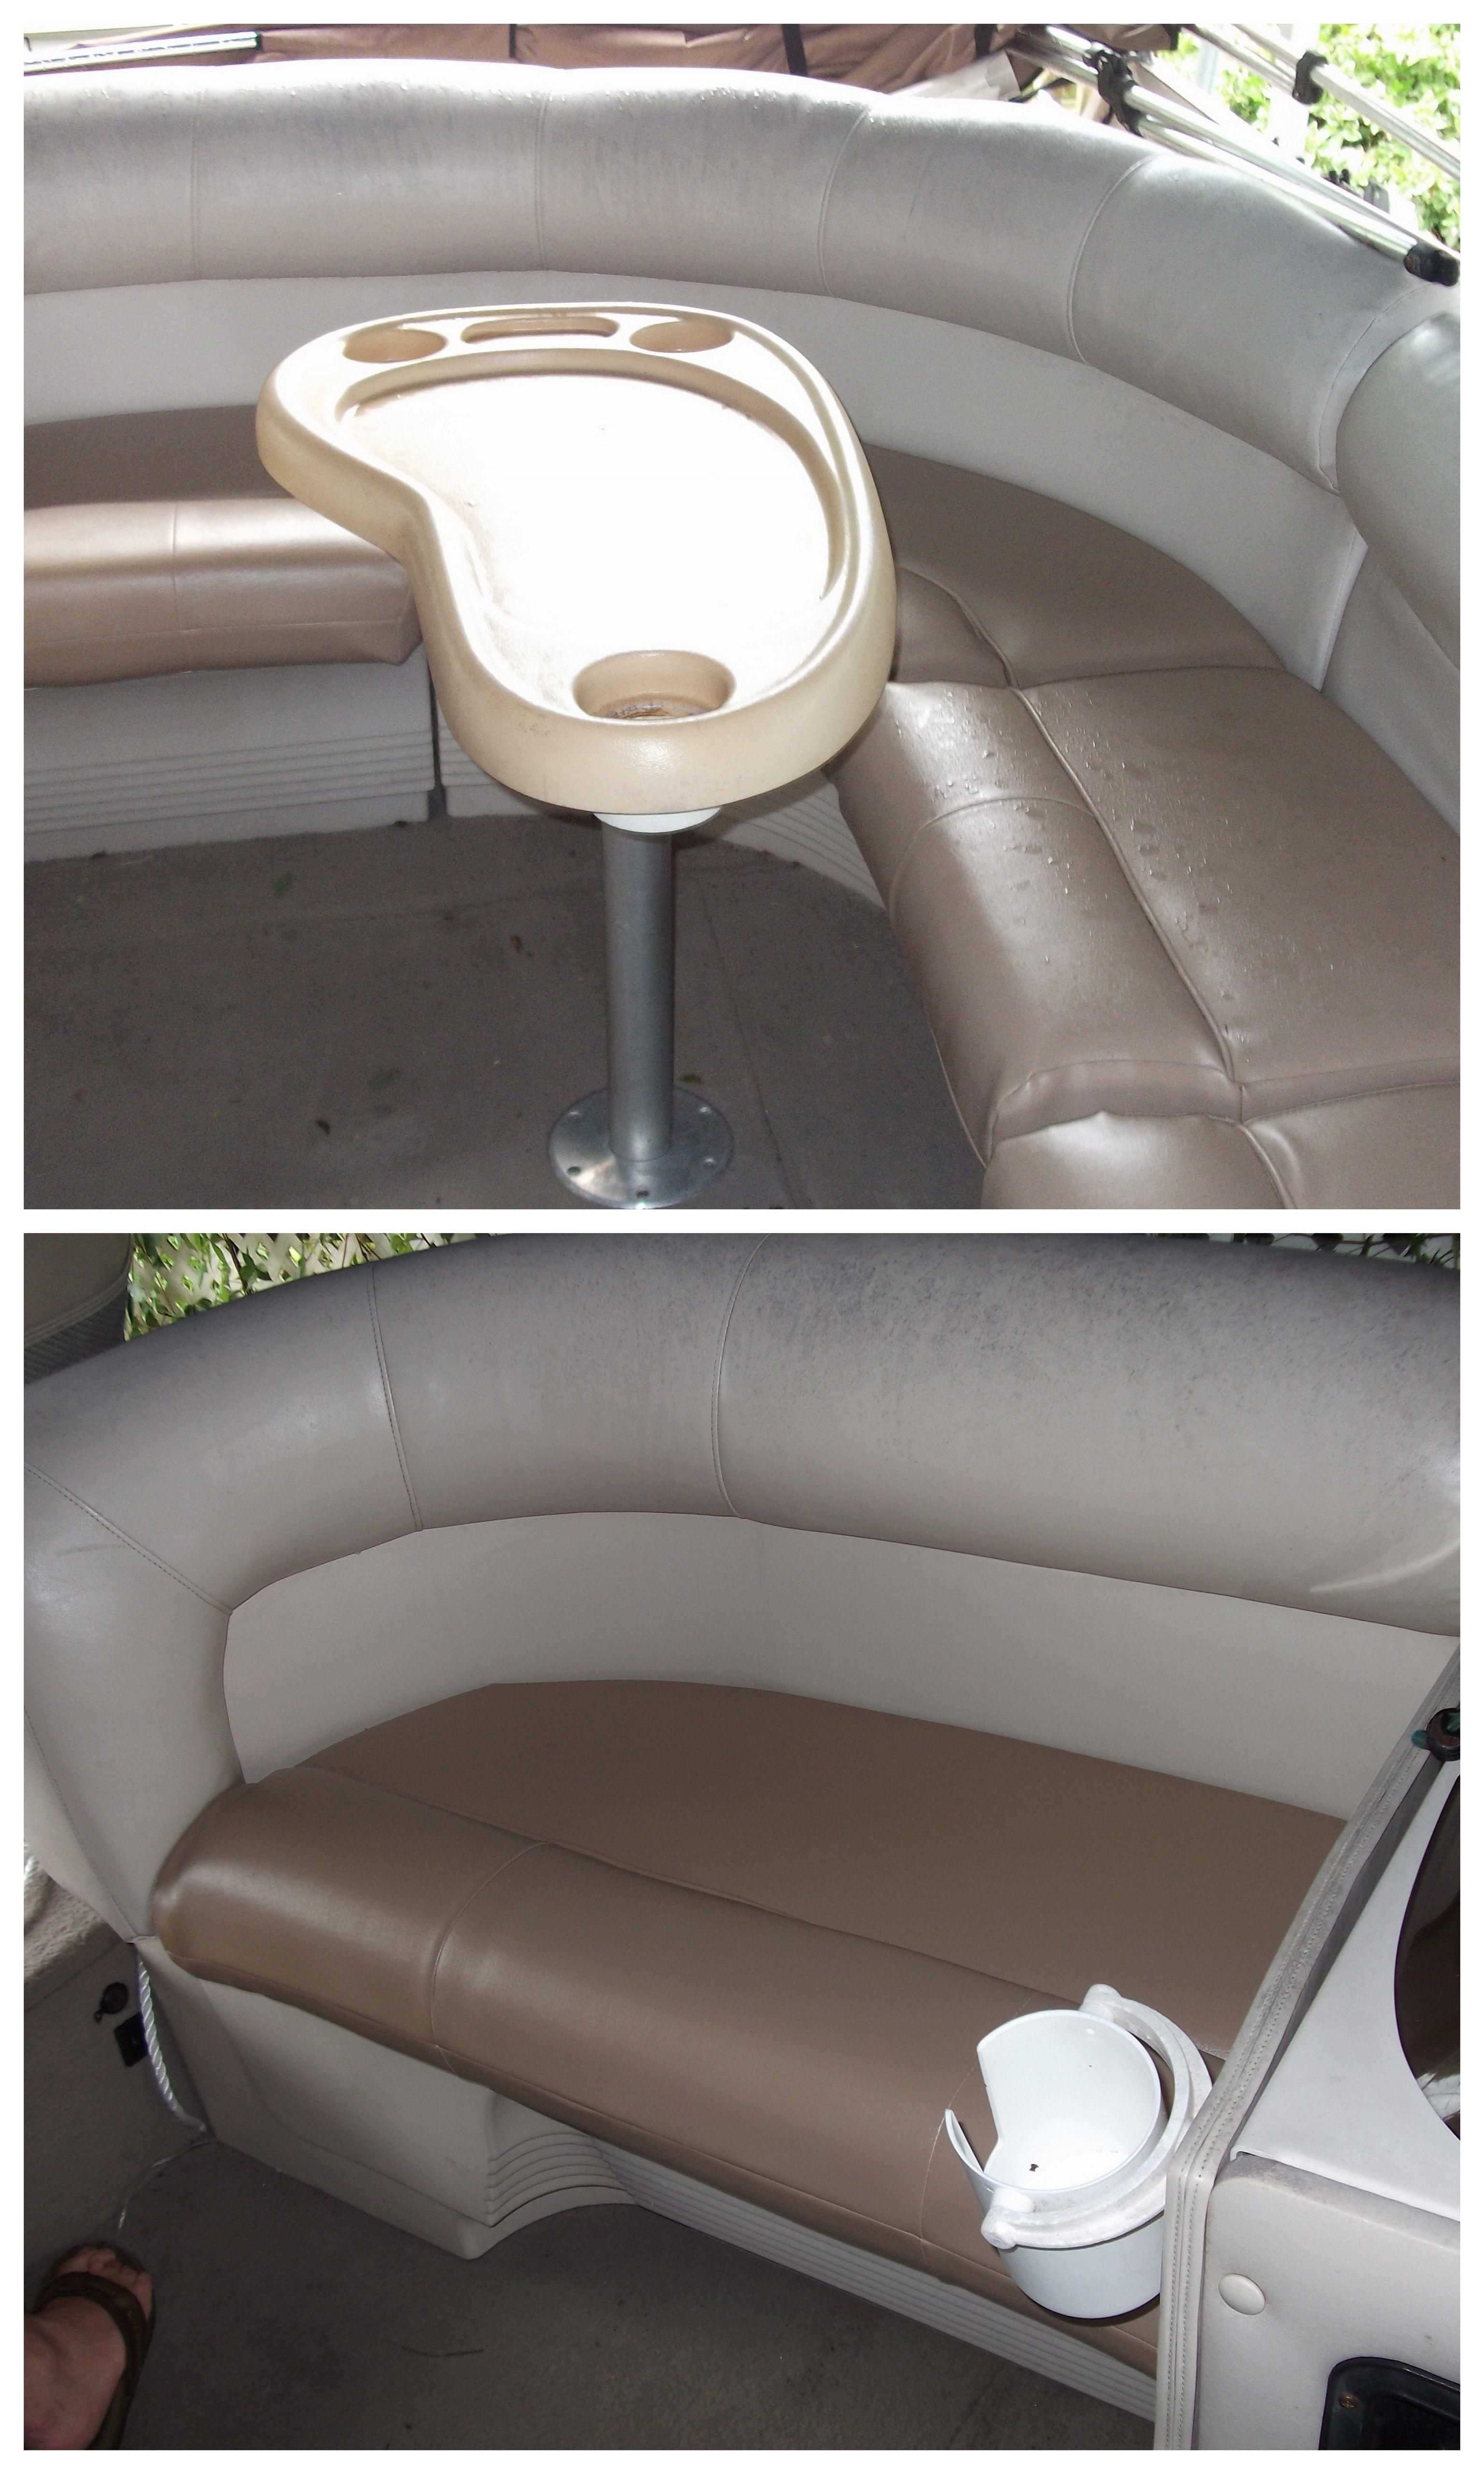 Boat Seats DixieStitch Upholstery   Boat decor, Boat seats ...